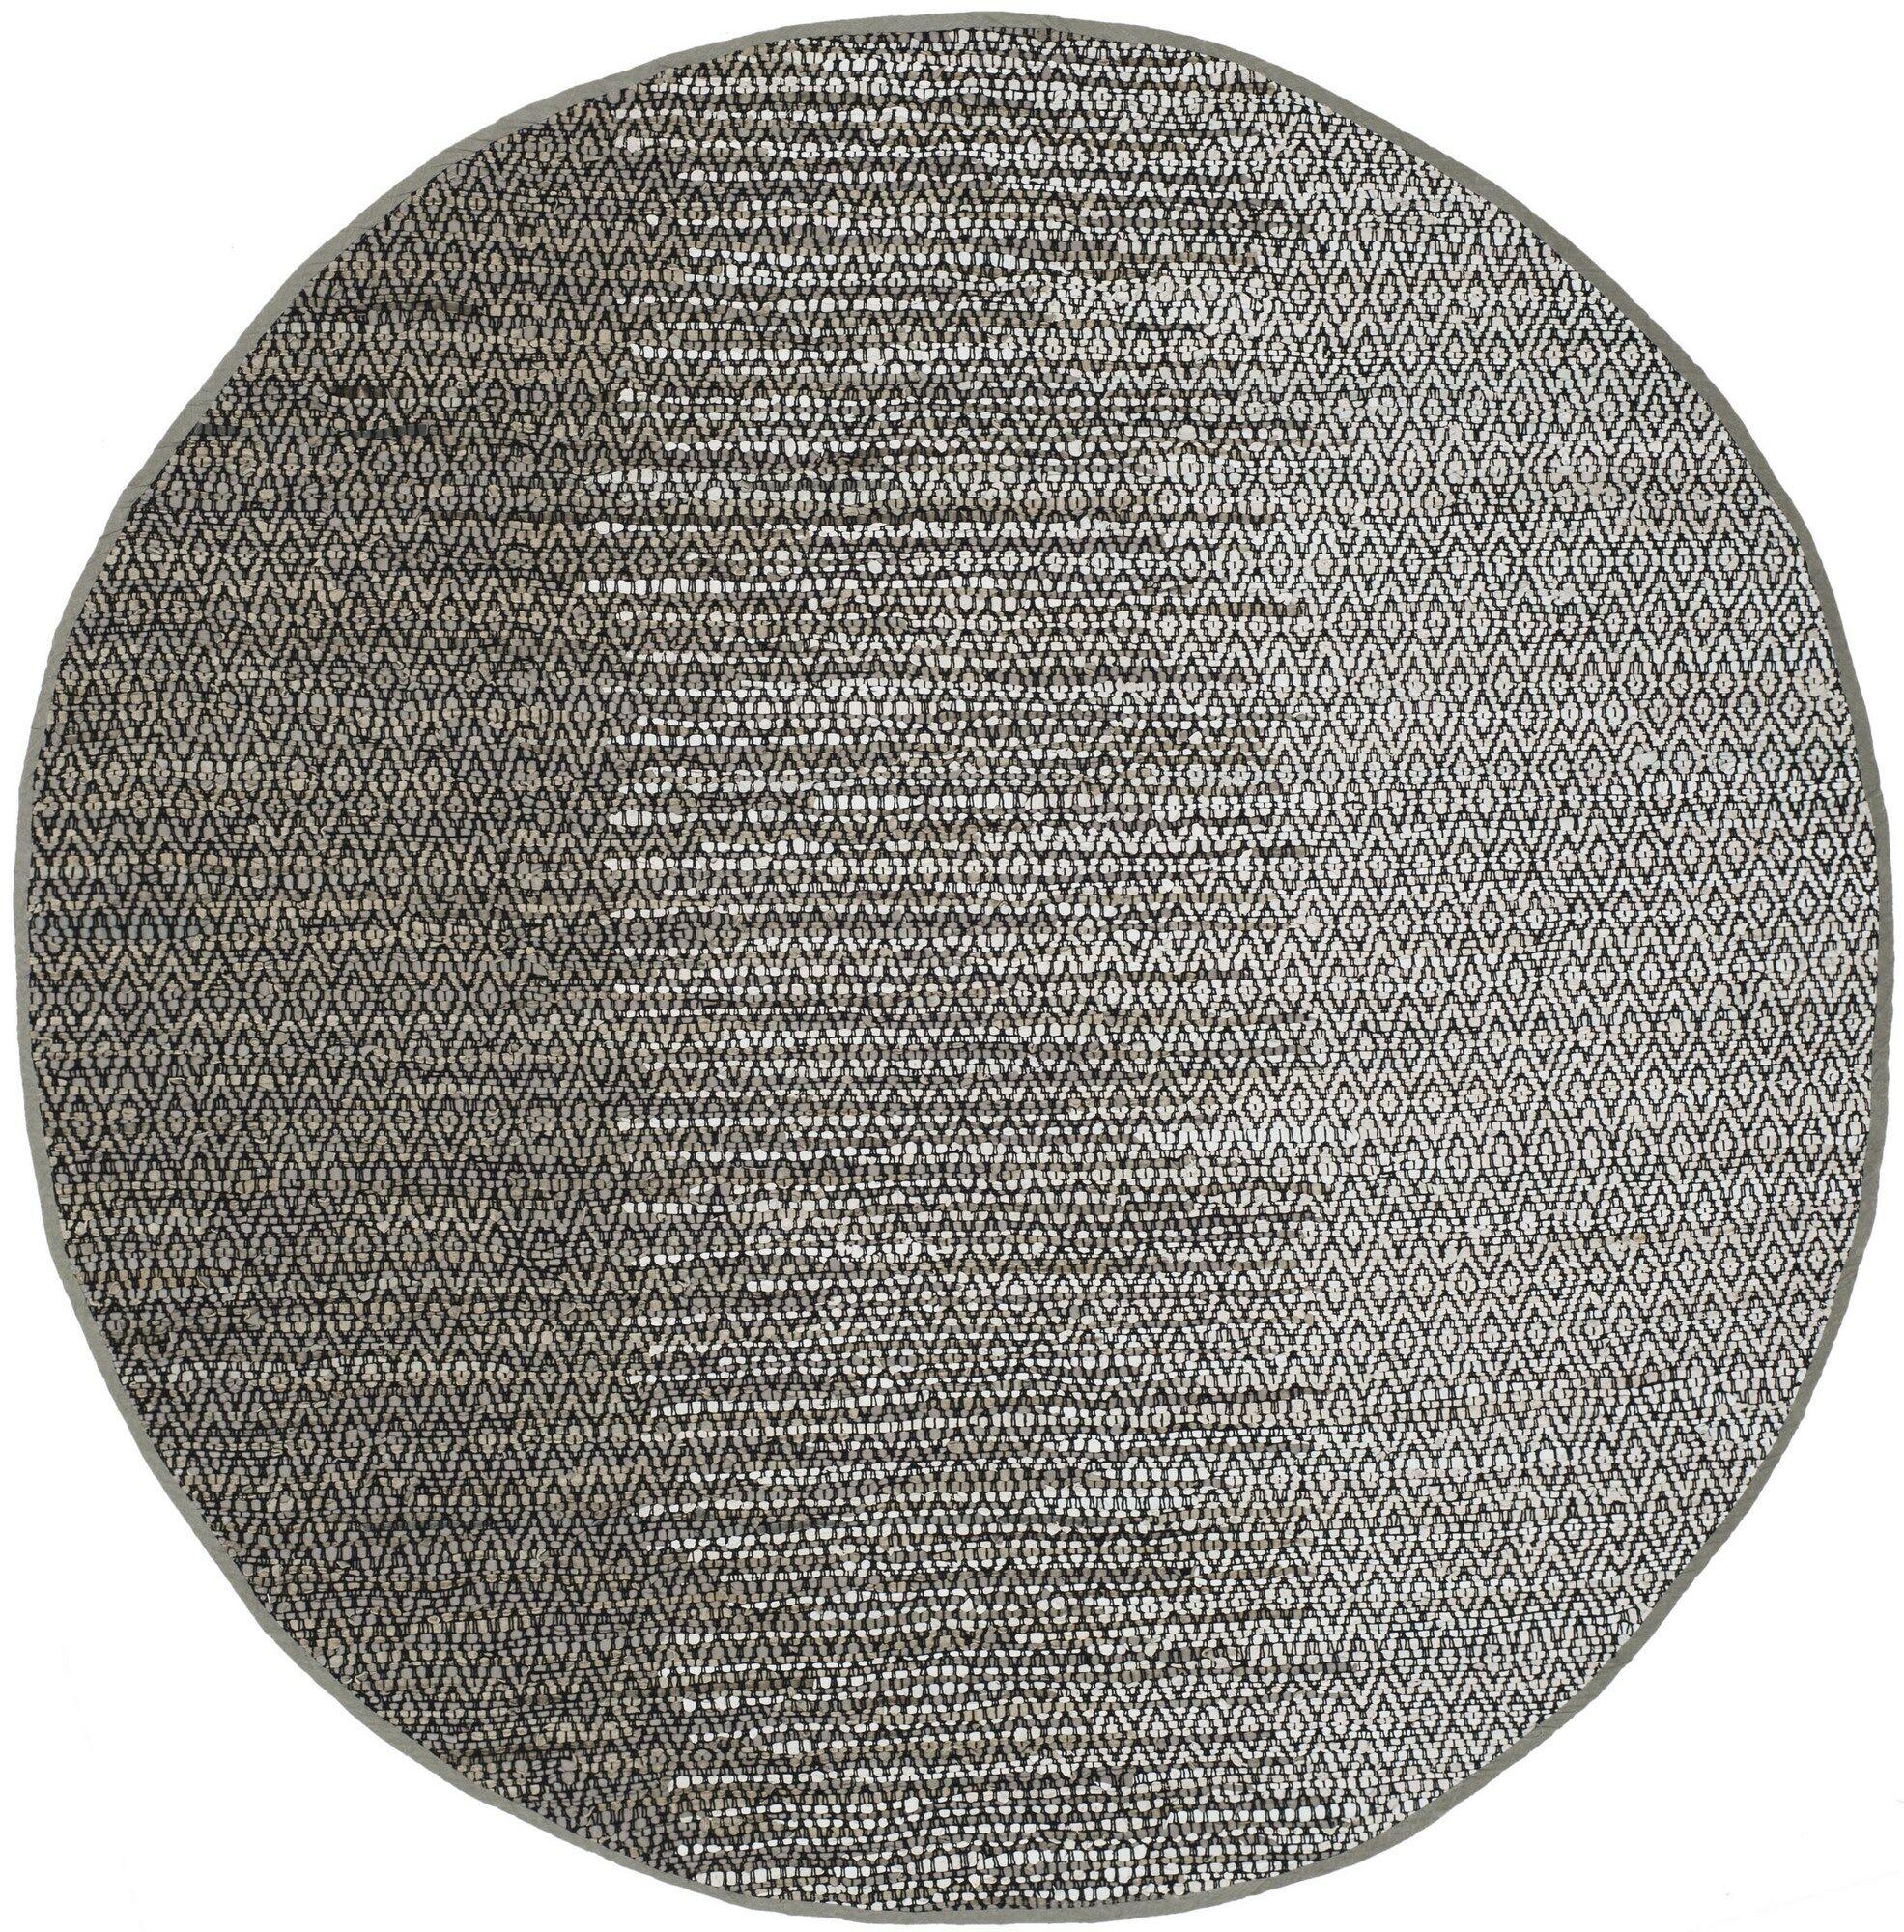 Erik Hand-Woven Light Grey/Grey Area Rug Rug Size: Round 6'